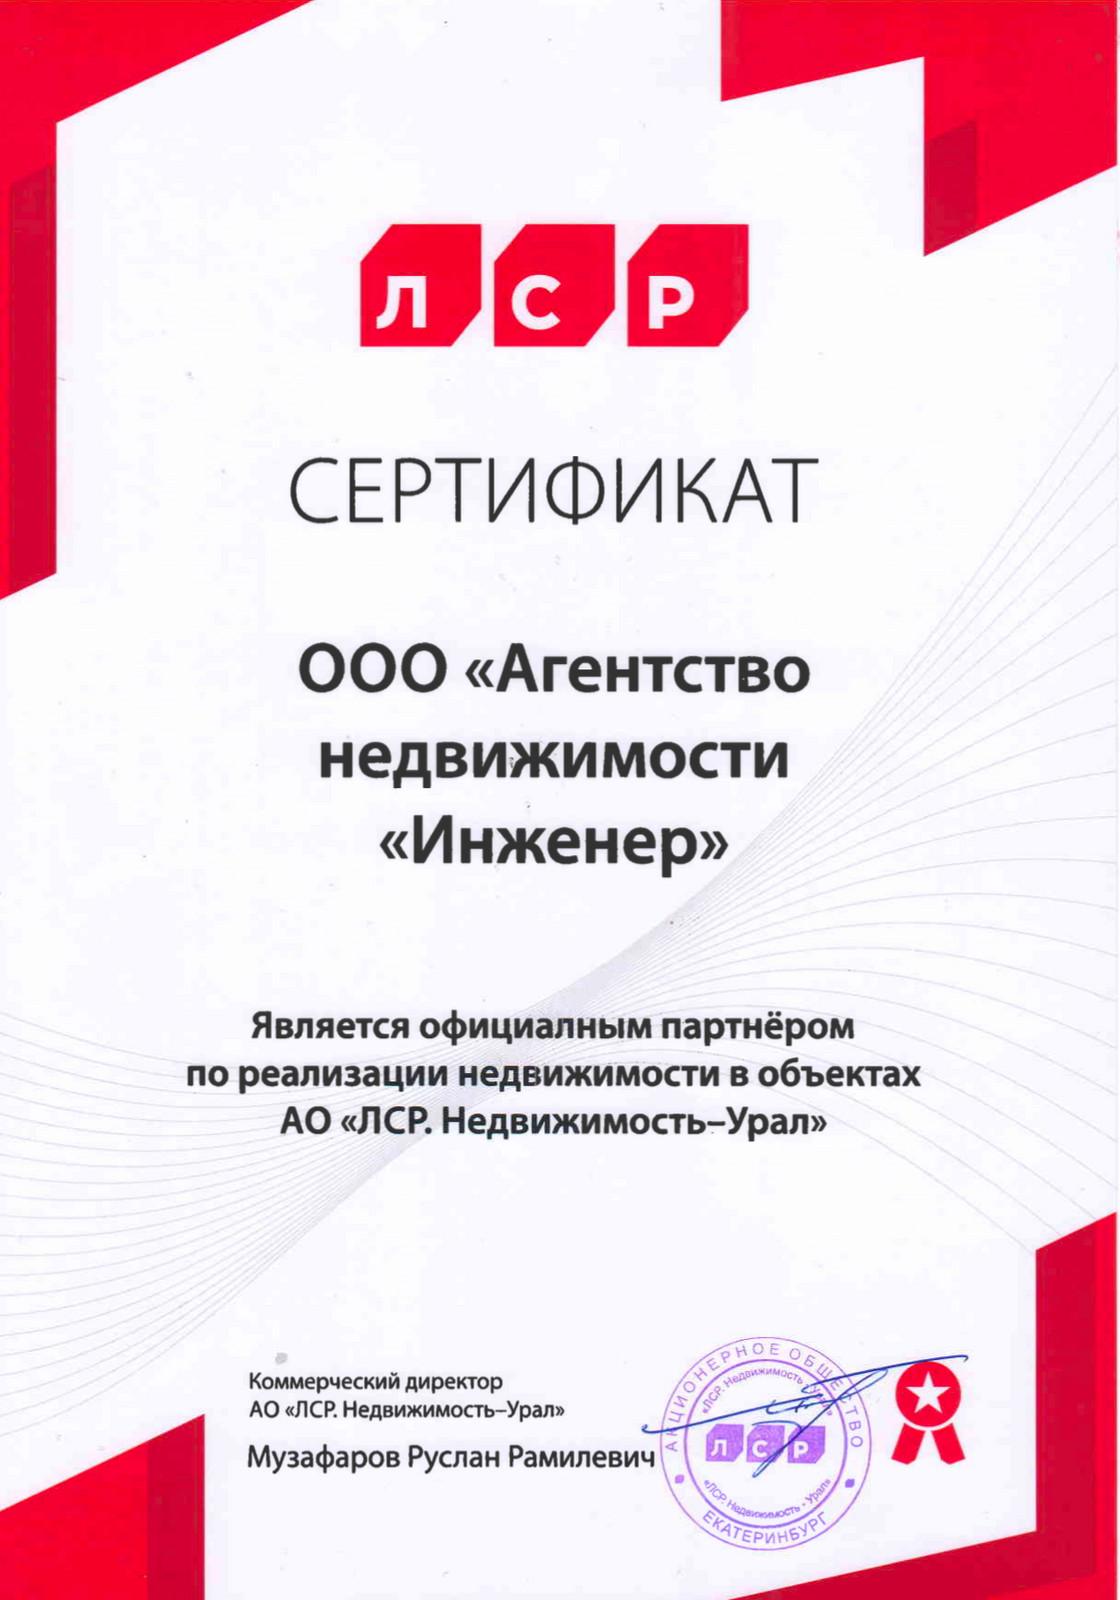 b65ea32e5dede ЛСР .jpg · ЛСР Москва.jpg · Серитификат ЛСР Екатеринбург.png ...